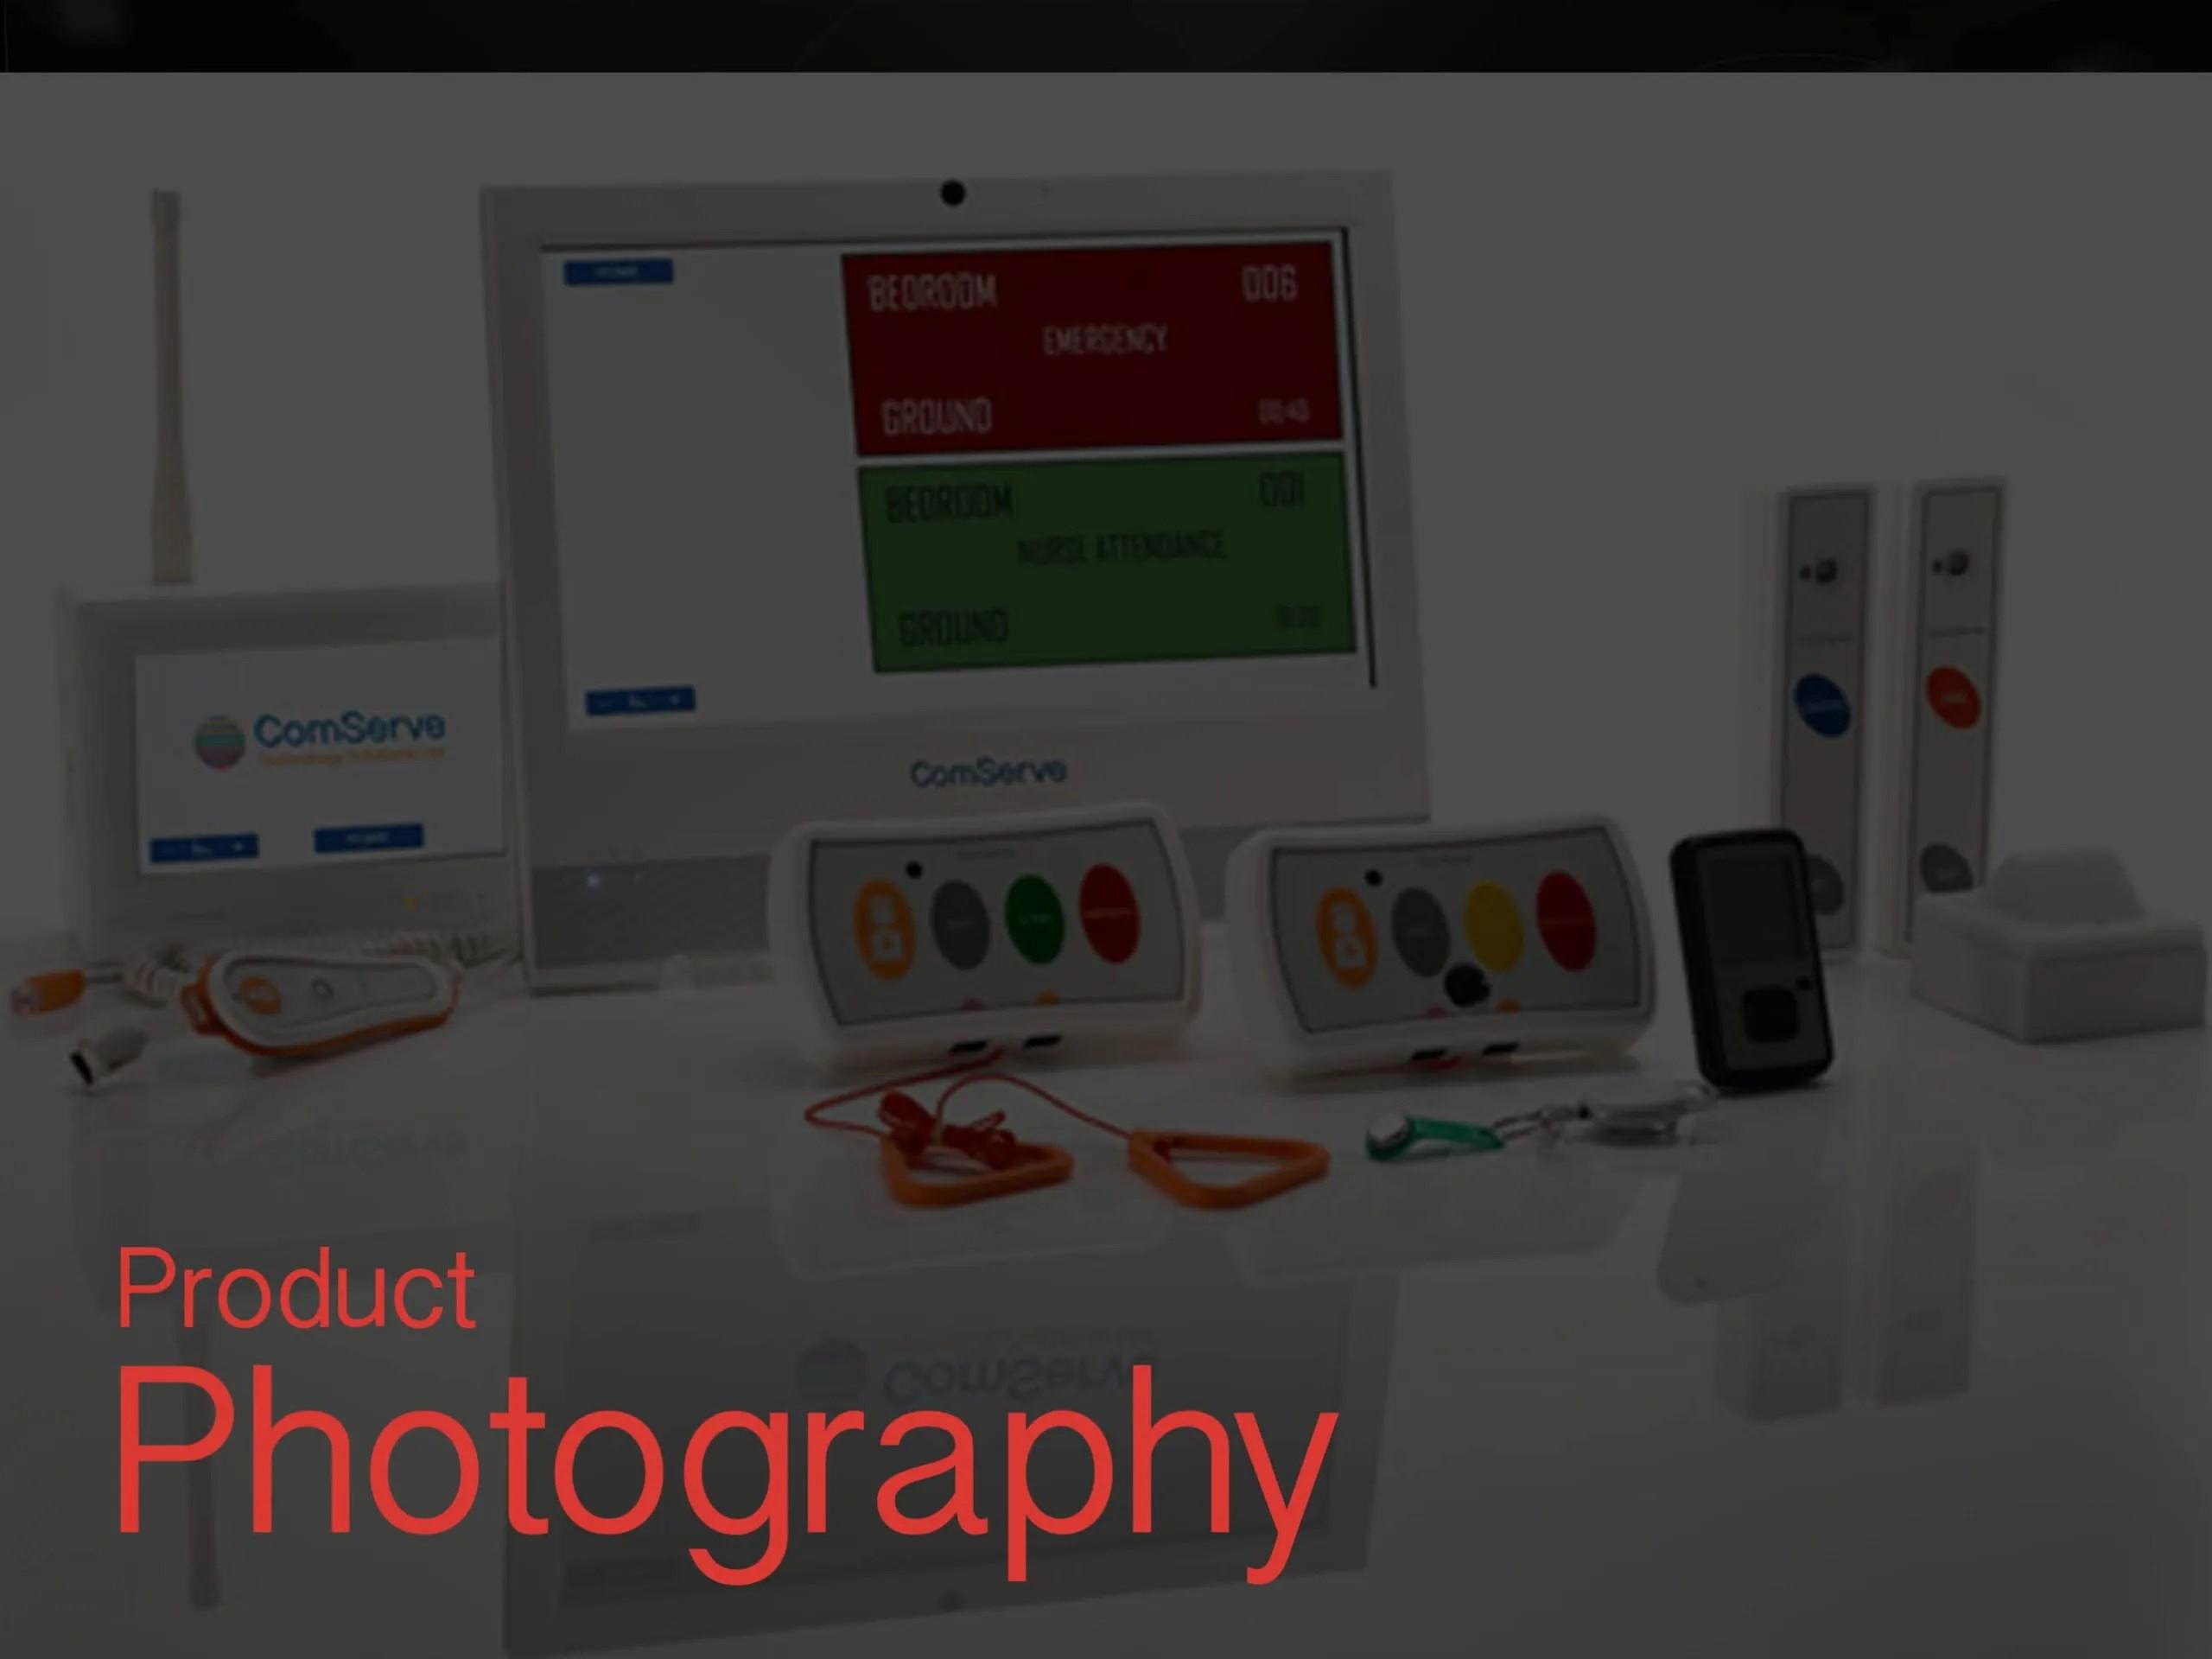 Care webdesign in norfolk